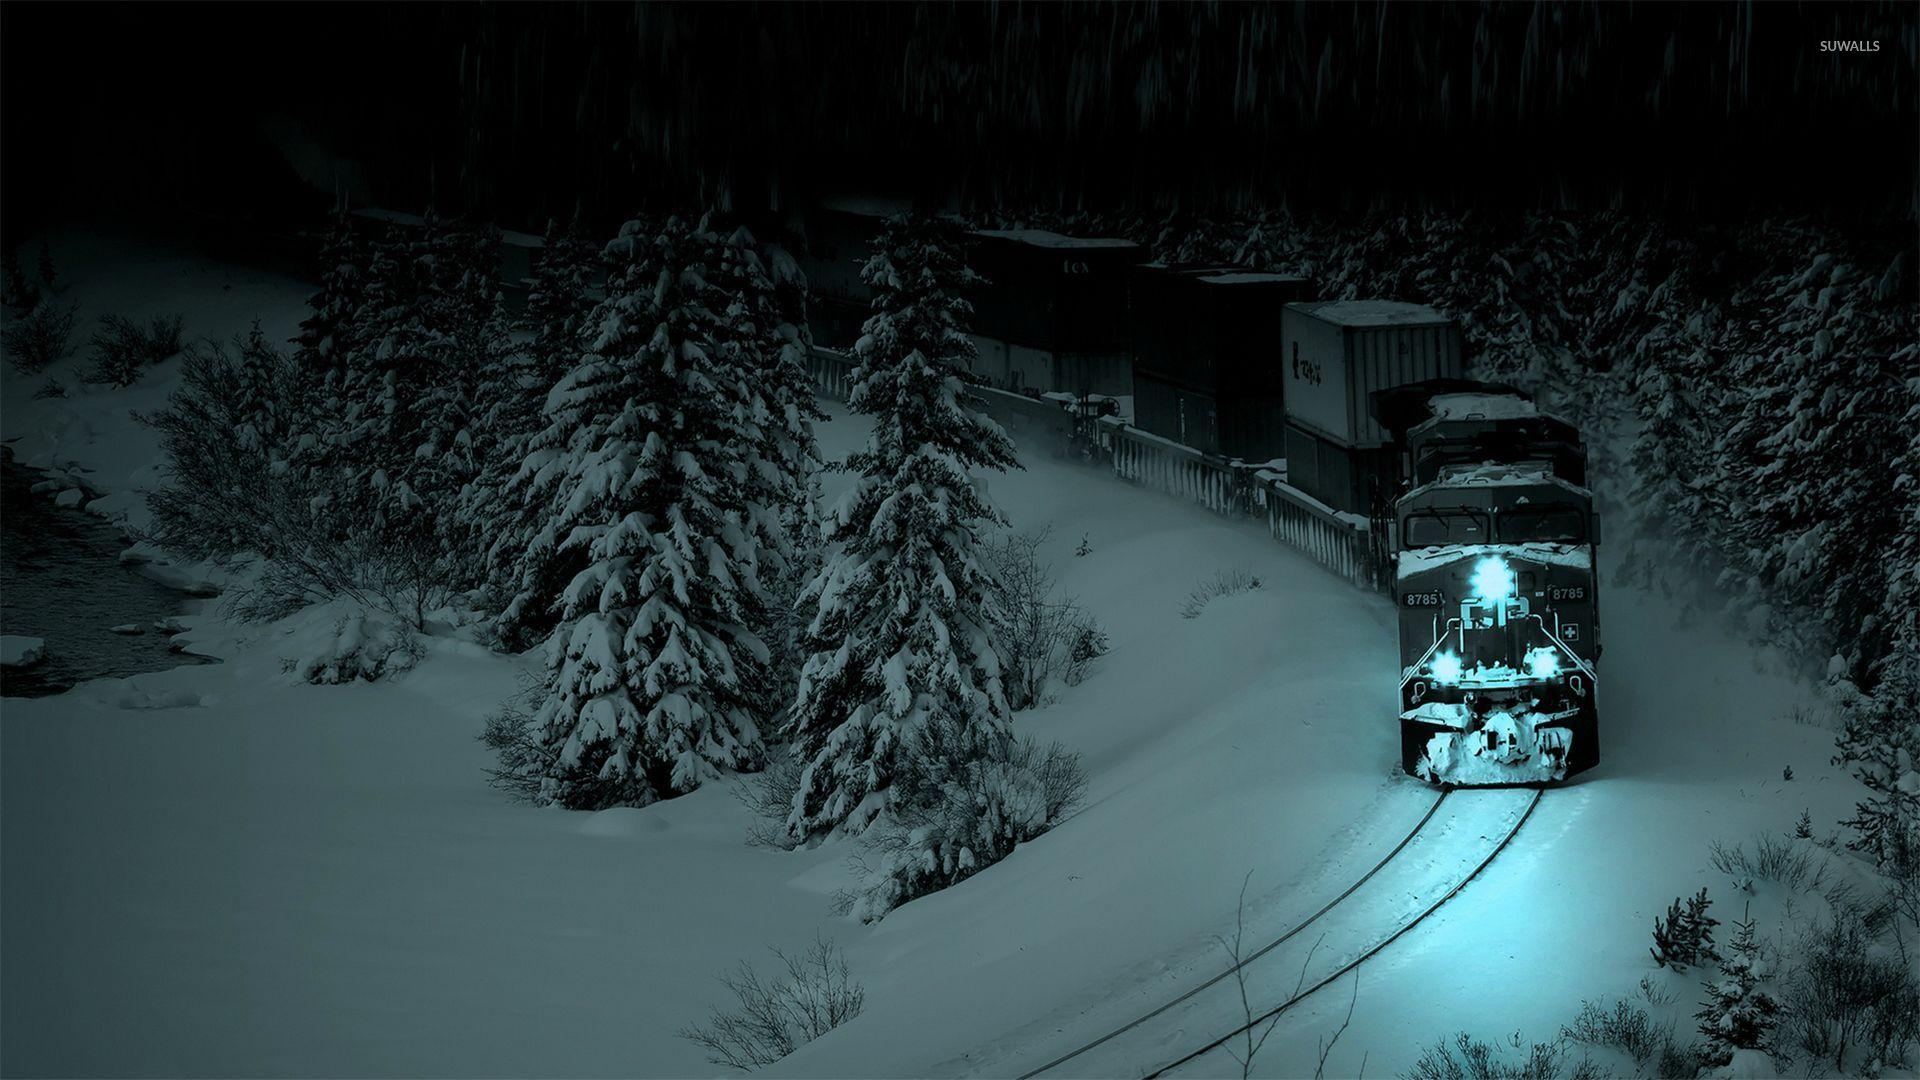 Train In The Winter Night Wallpaper